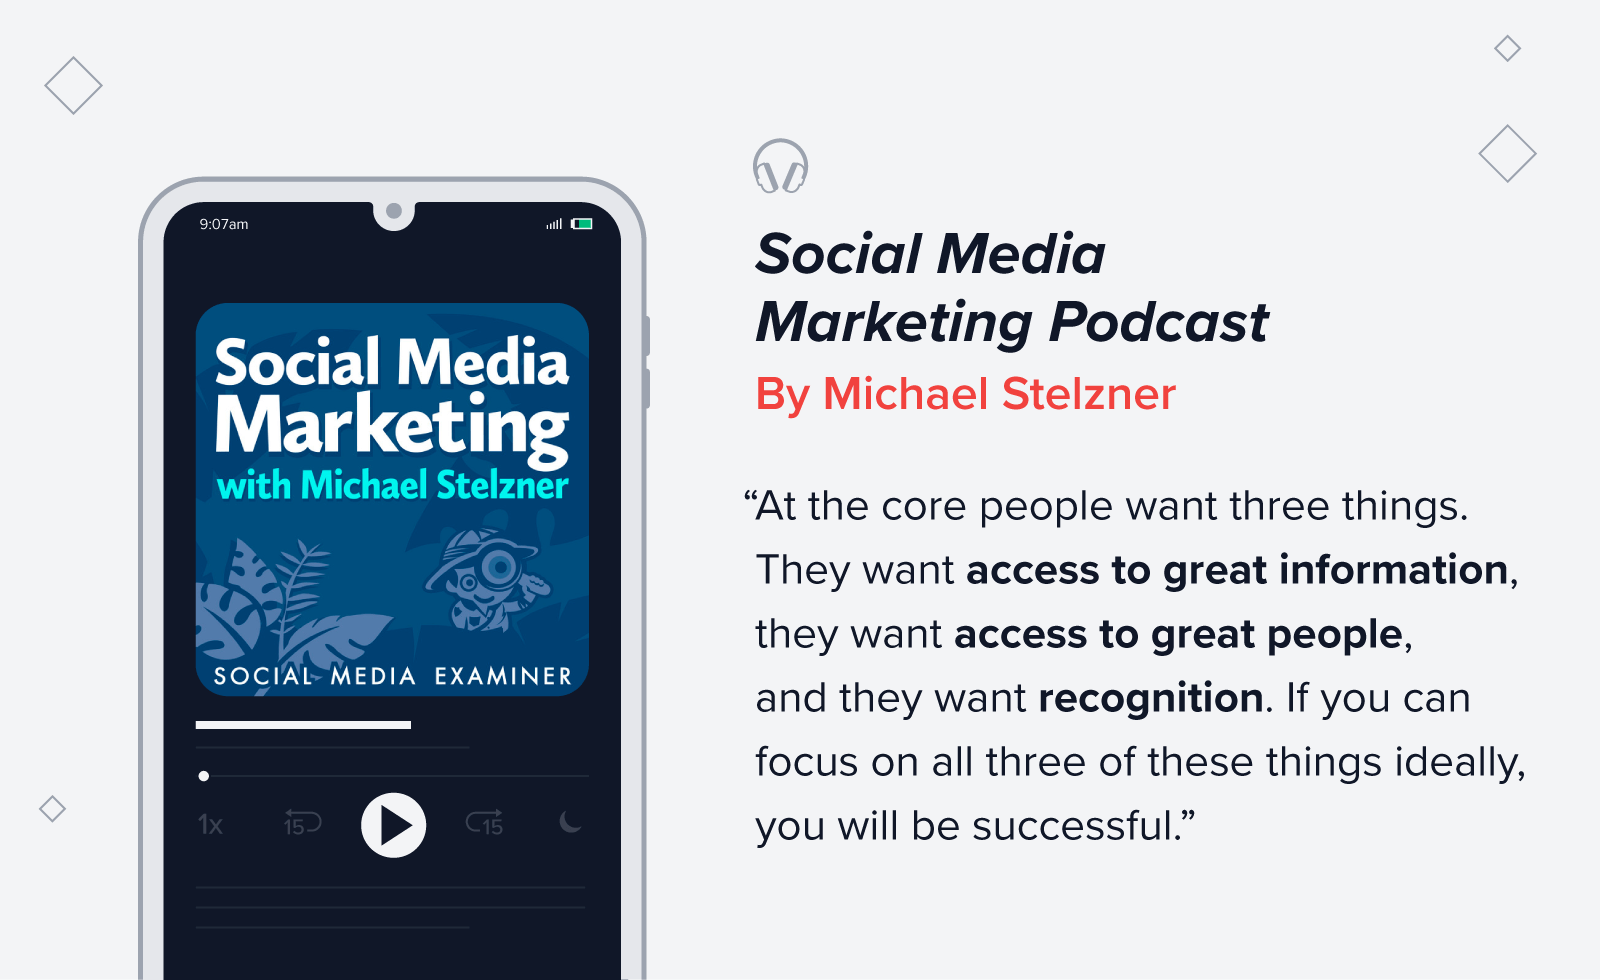 Social Media Marketing Podcast quote